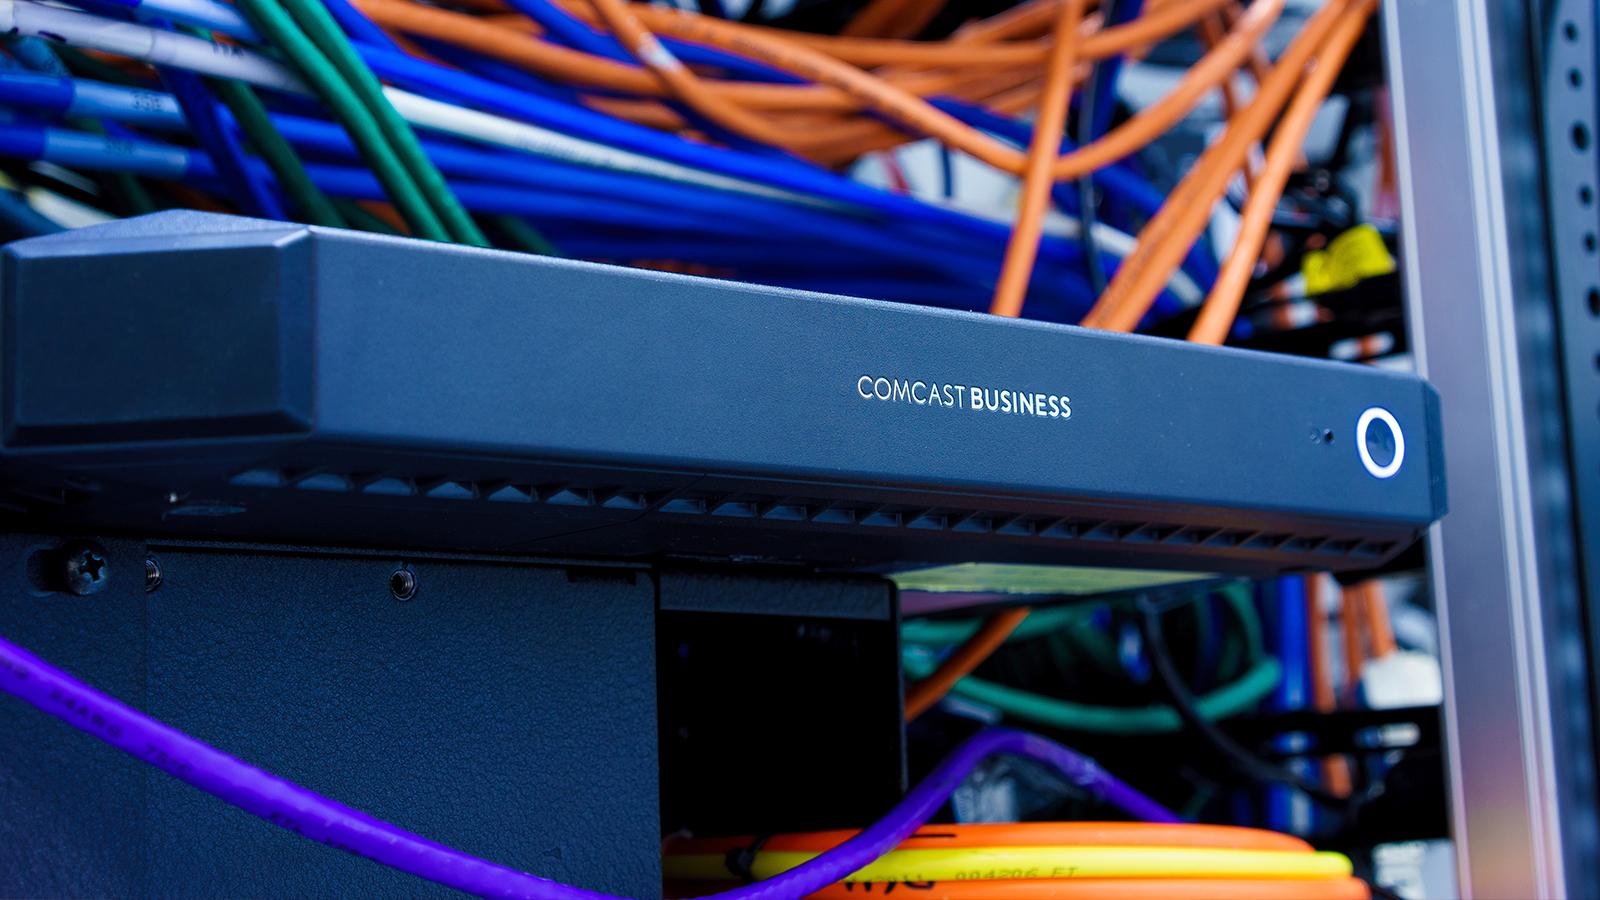 A Comcast Business router.